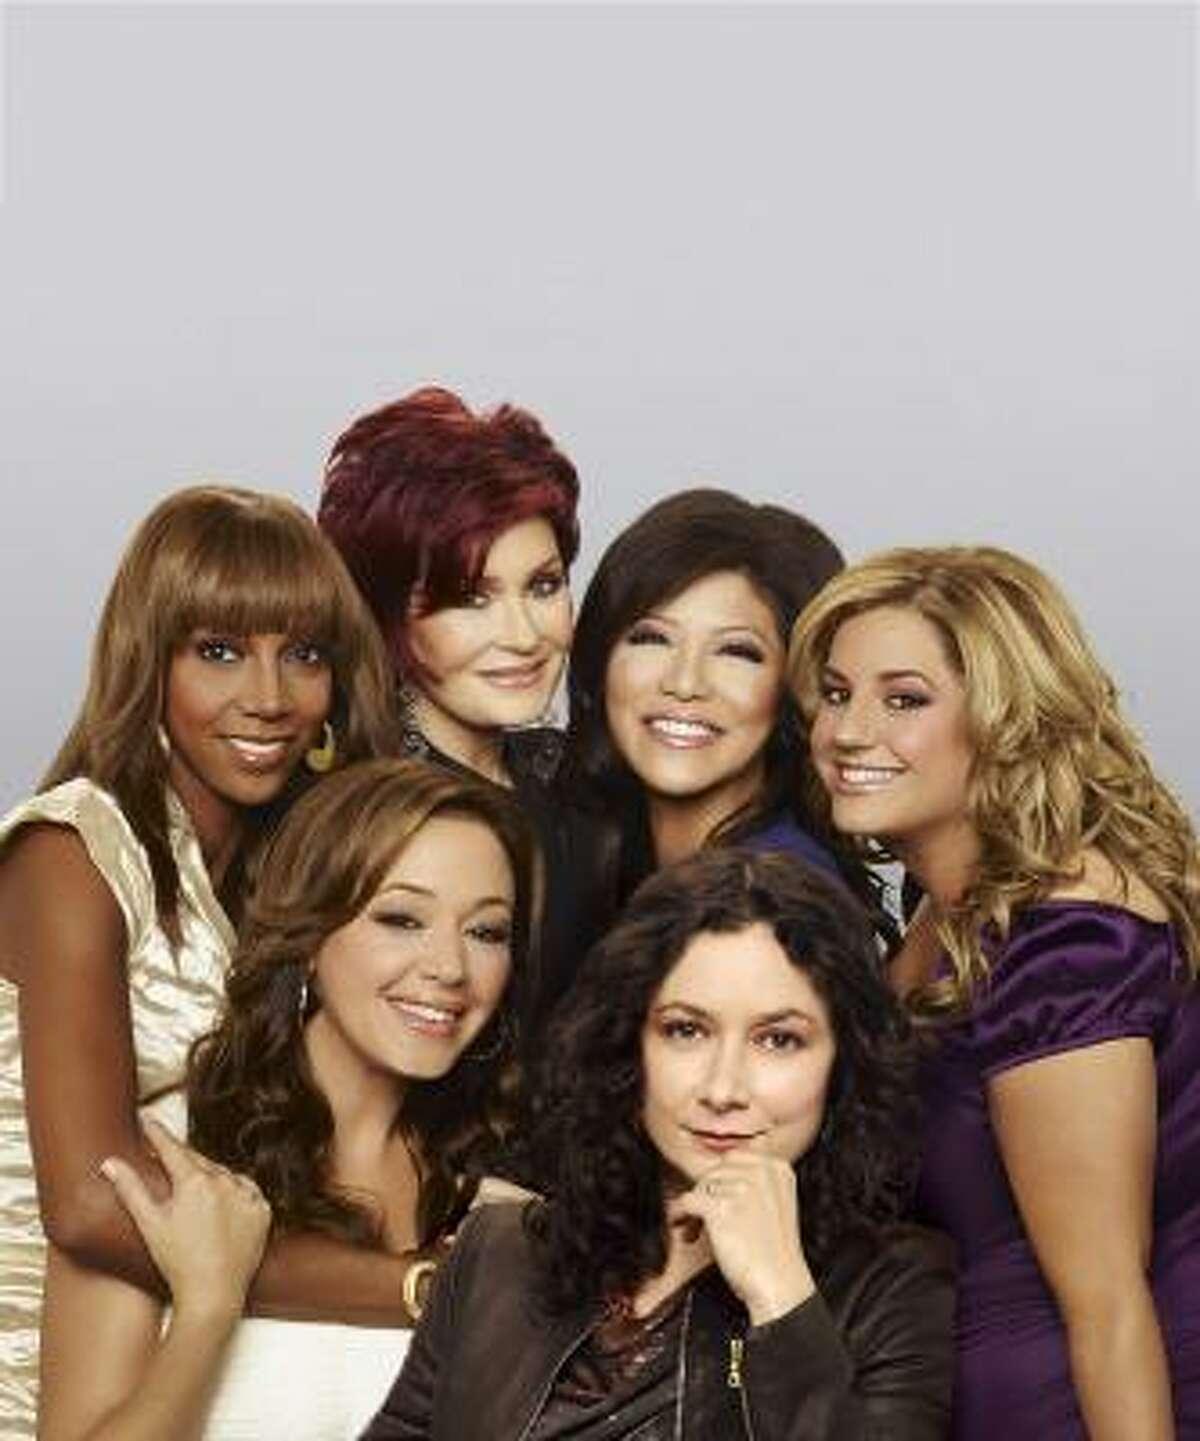 The Talk cast is, clockwise from top, Sharon Osbourne, Julie Chen, Marissa Jaret Winokur, Sara Gilbert, Leah Remini and Holly Robinson Peete.